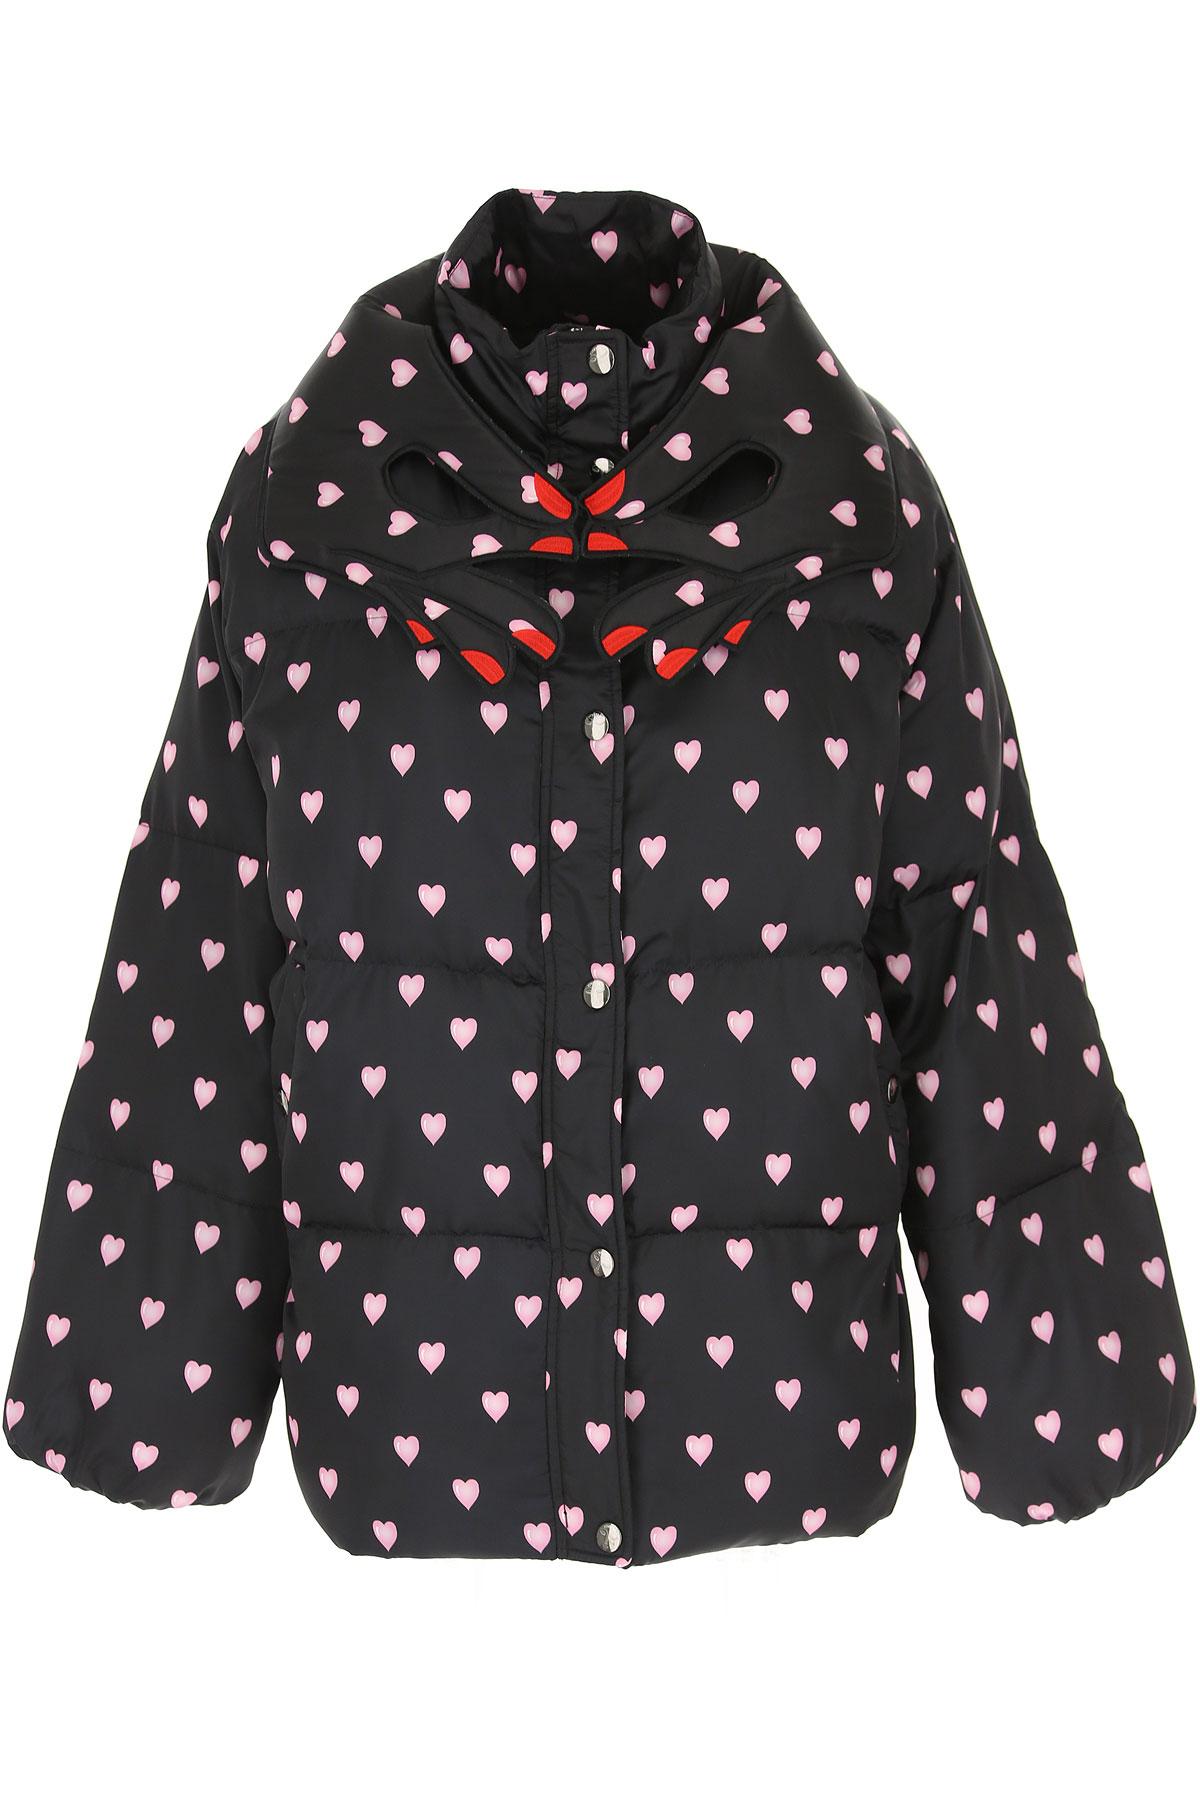 Image of Vivetta Down Jacket for Women, Puffer Ski Jacket, Black, polyester, 2017, 2 4 6